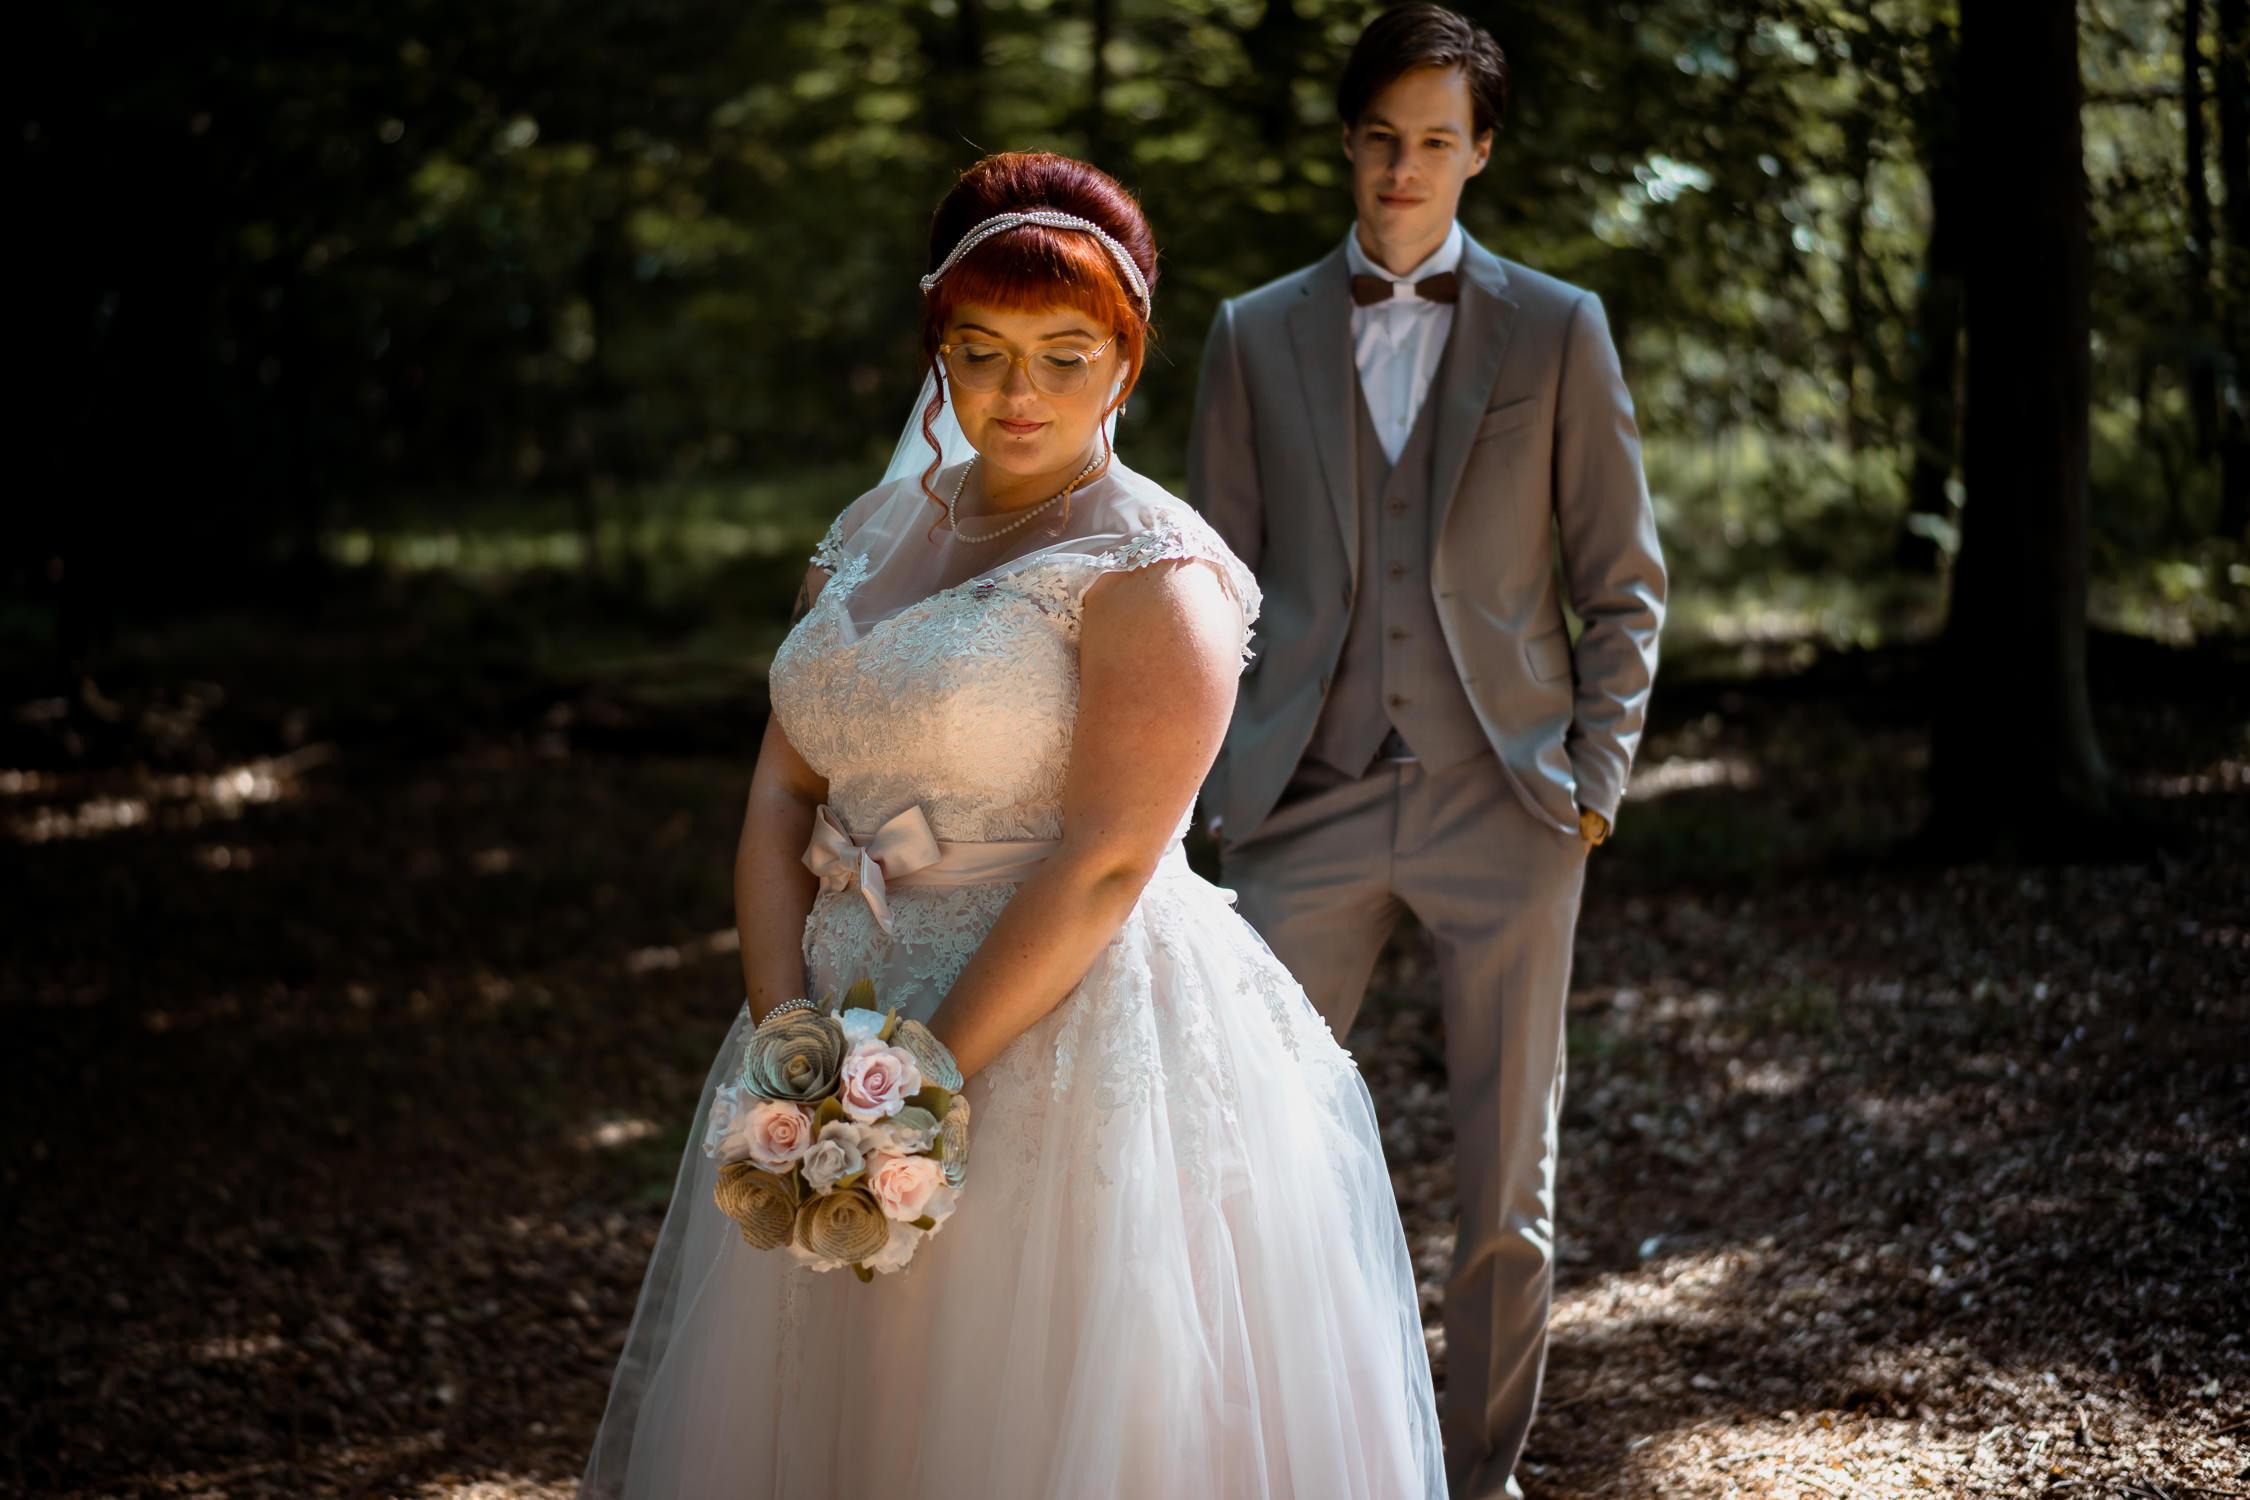 romantisch portret bruidspaar mark hadden bruiloft fotograaf amsterdam utrecht